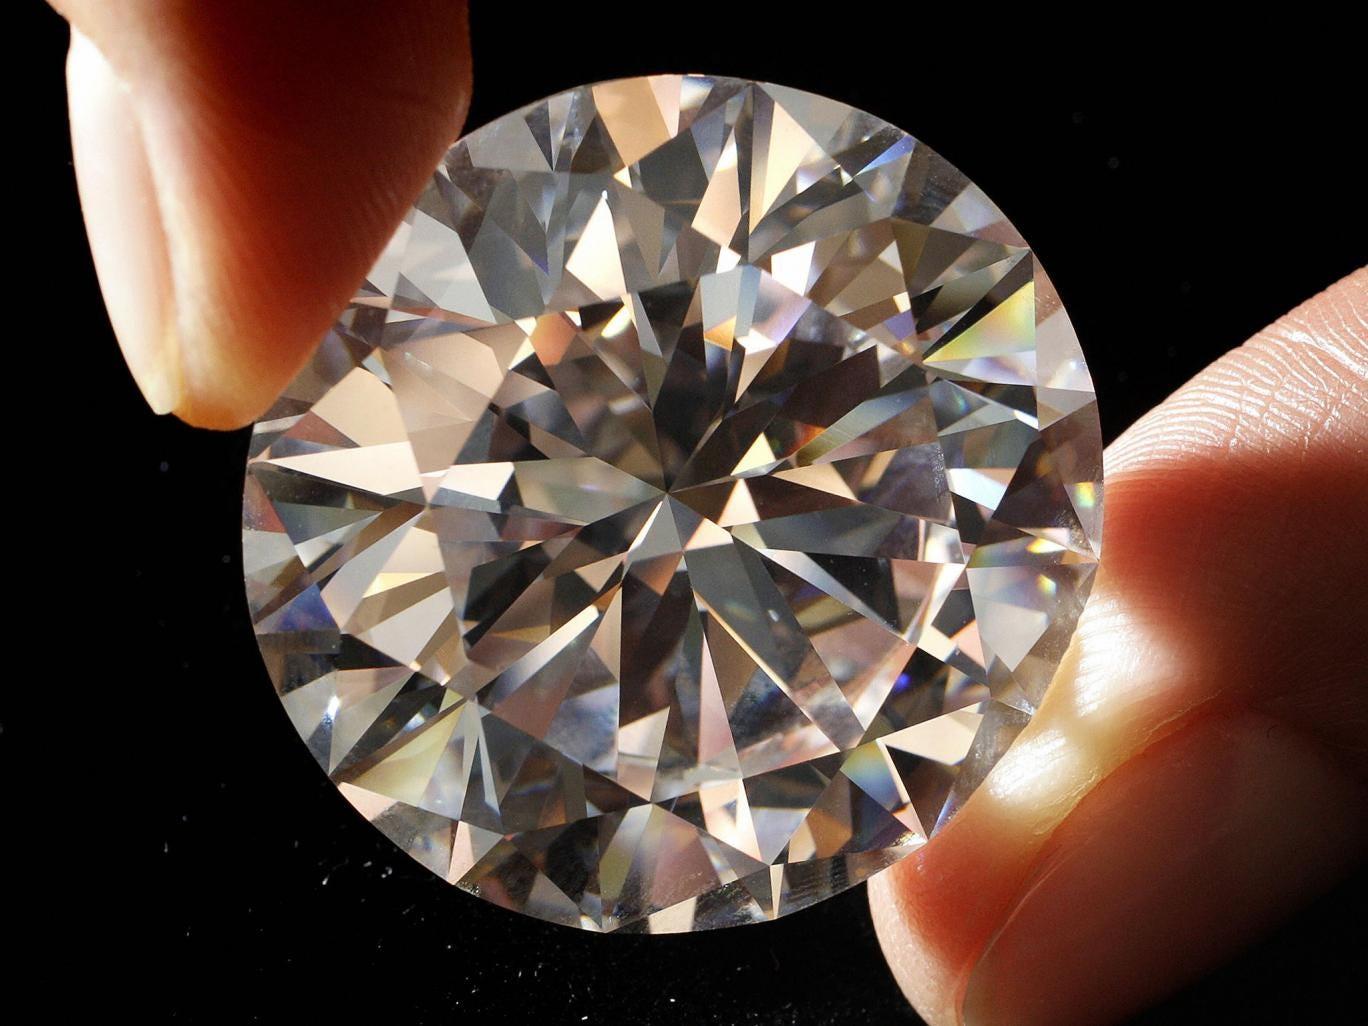 Diamonds worth £1,000 will be hidden across Cheltenham